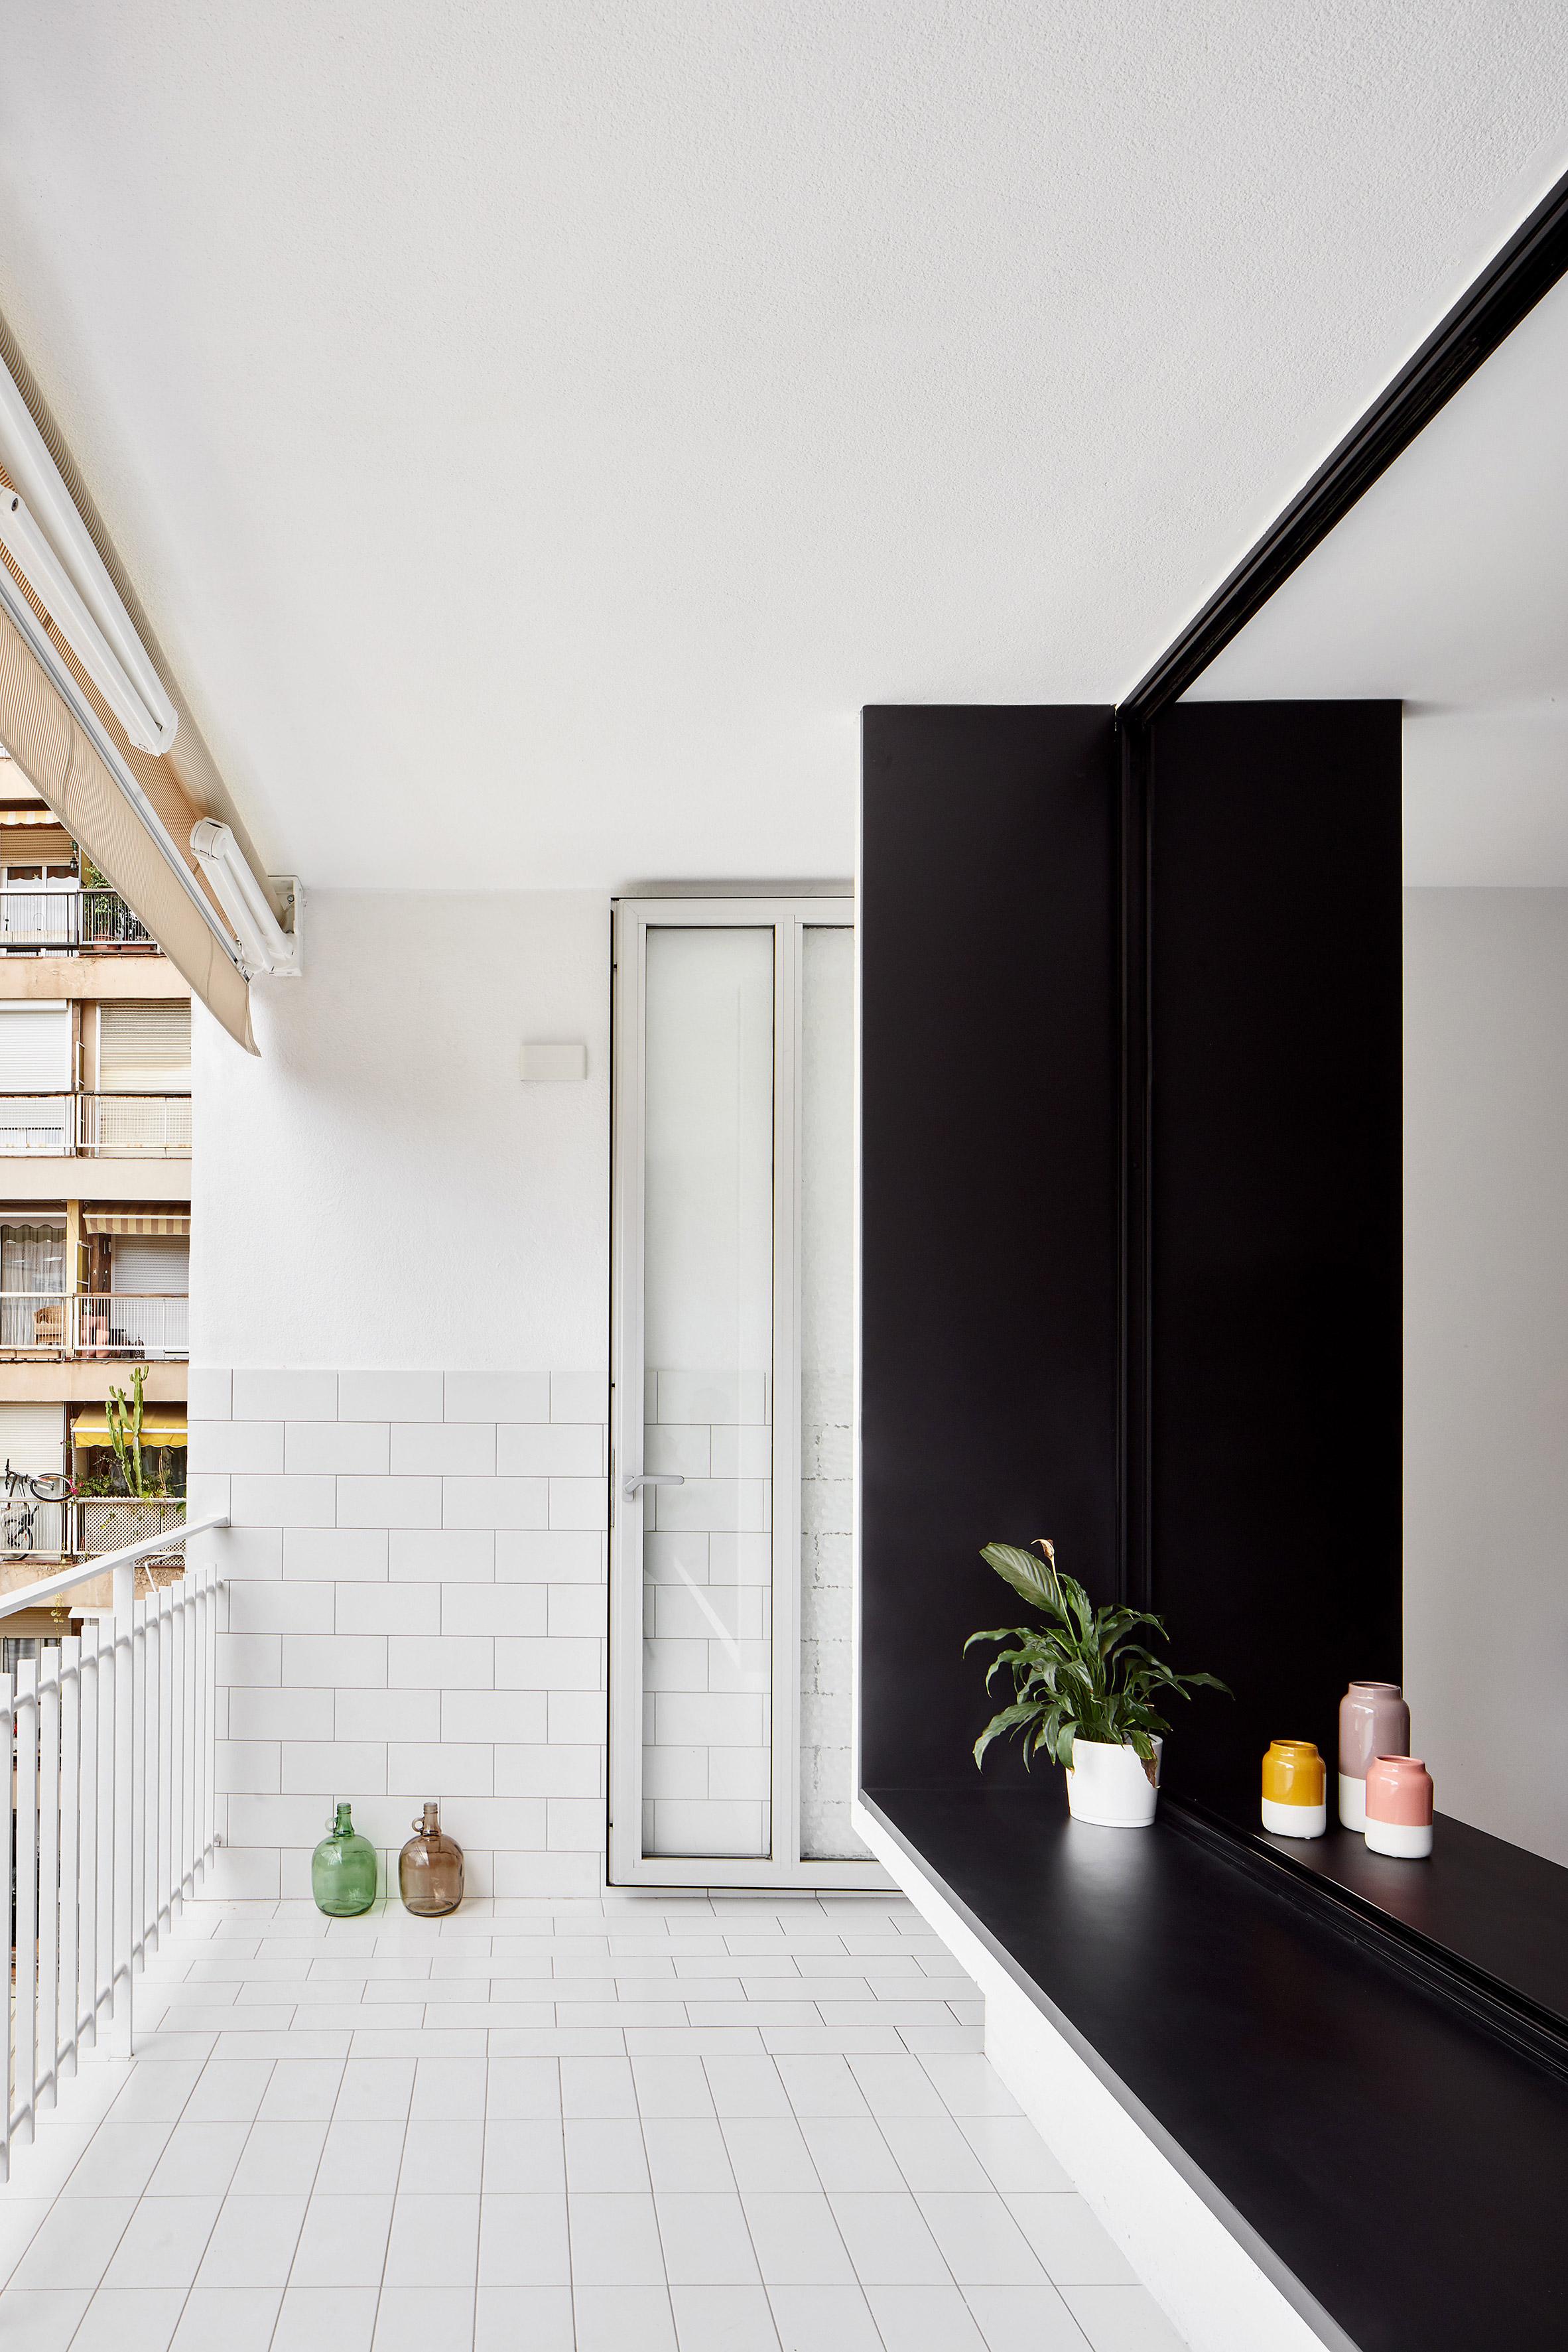 Villarroel apartment by Raul Sanchez Architects